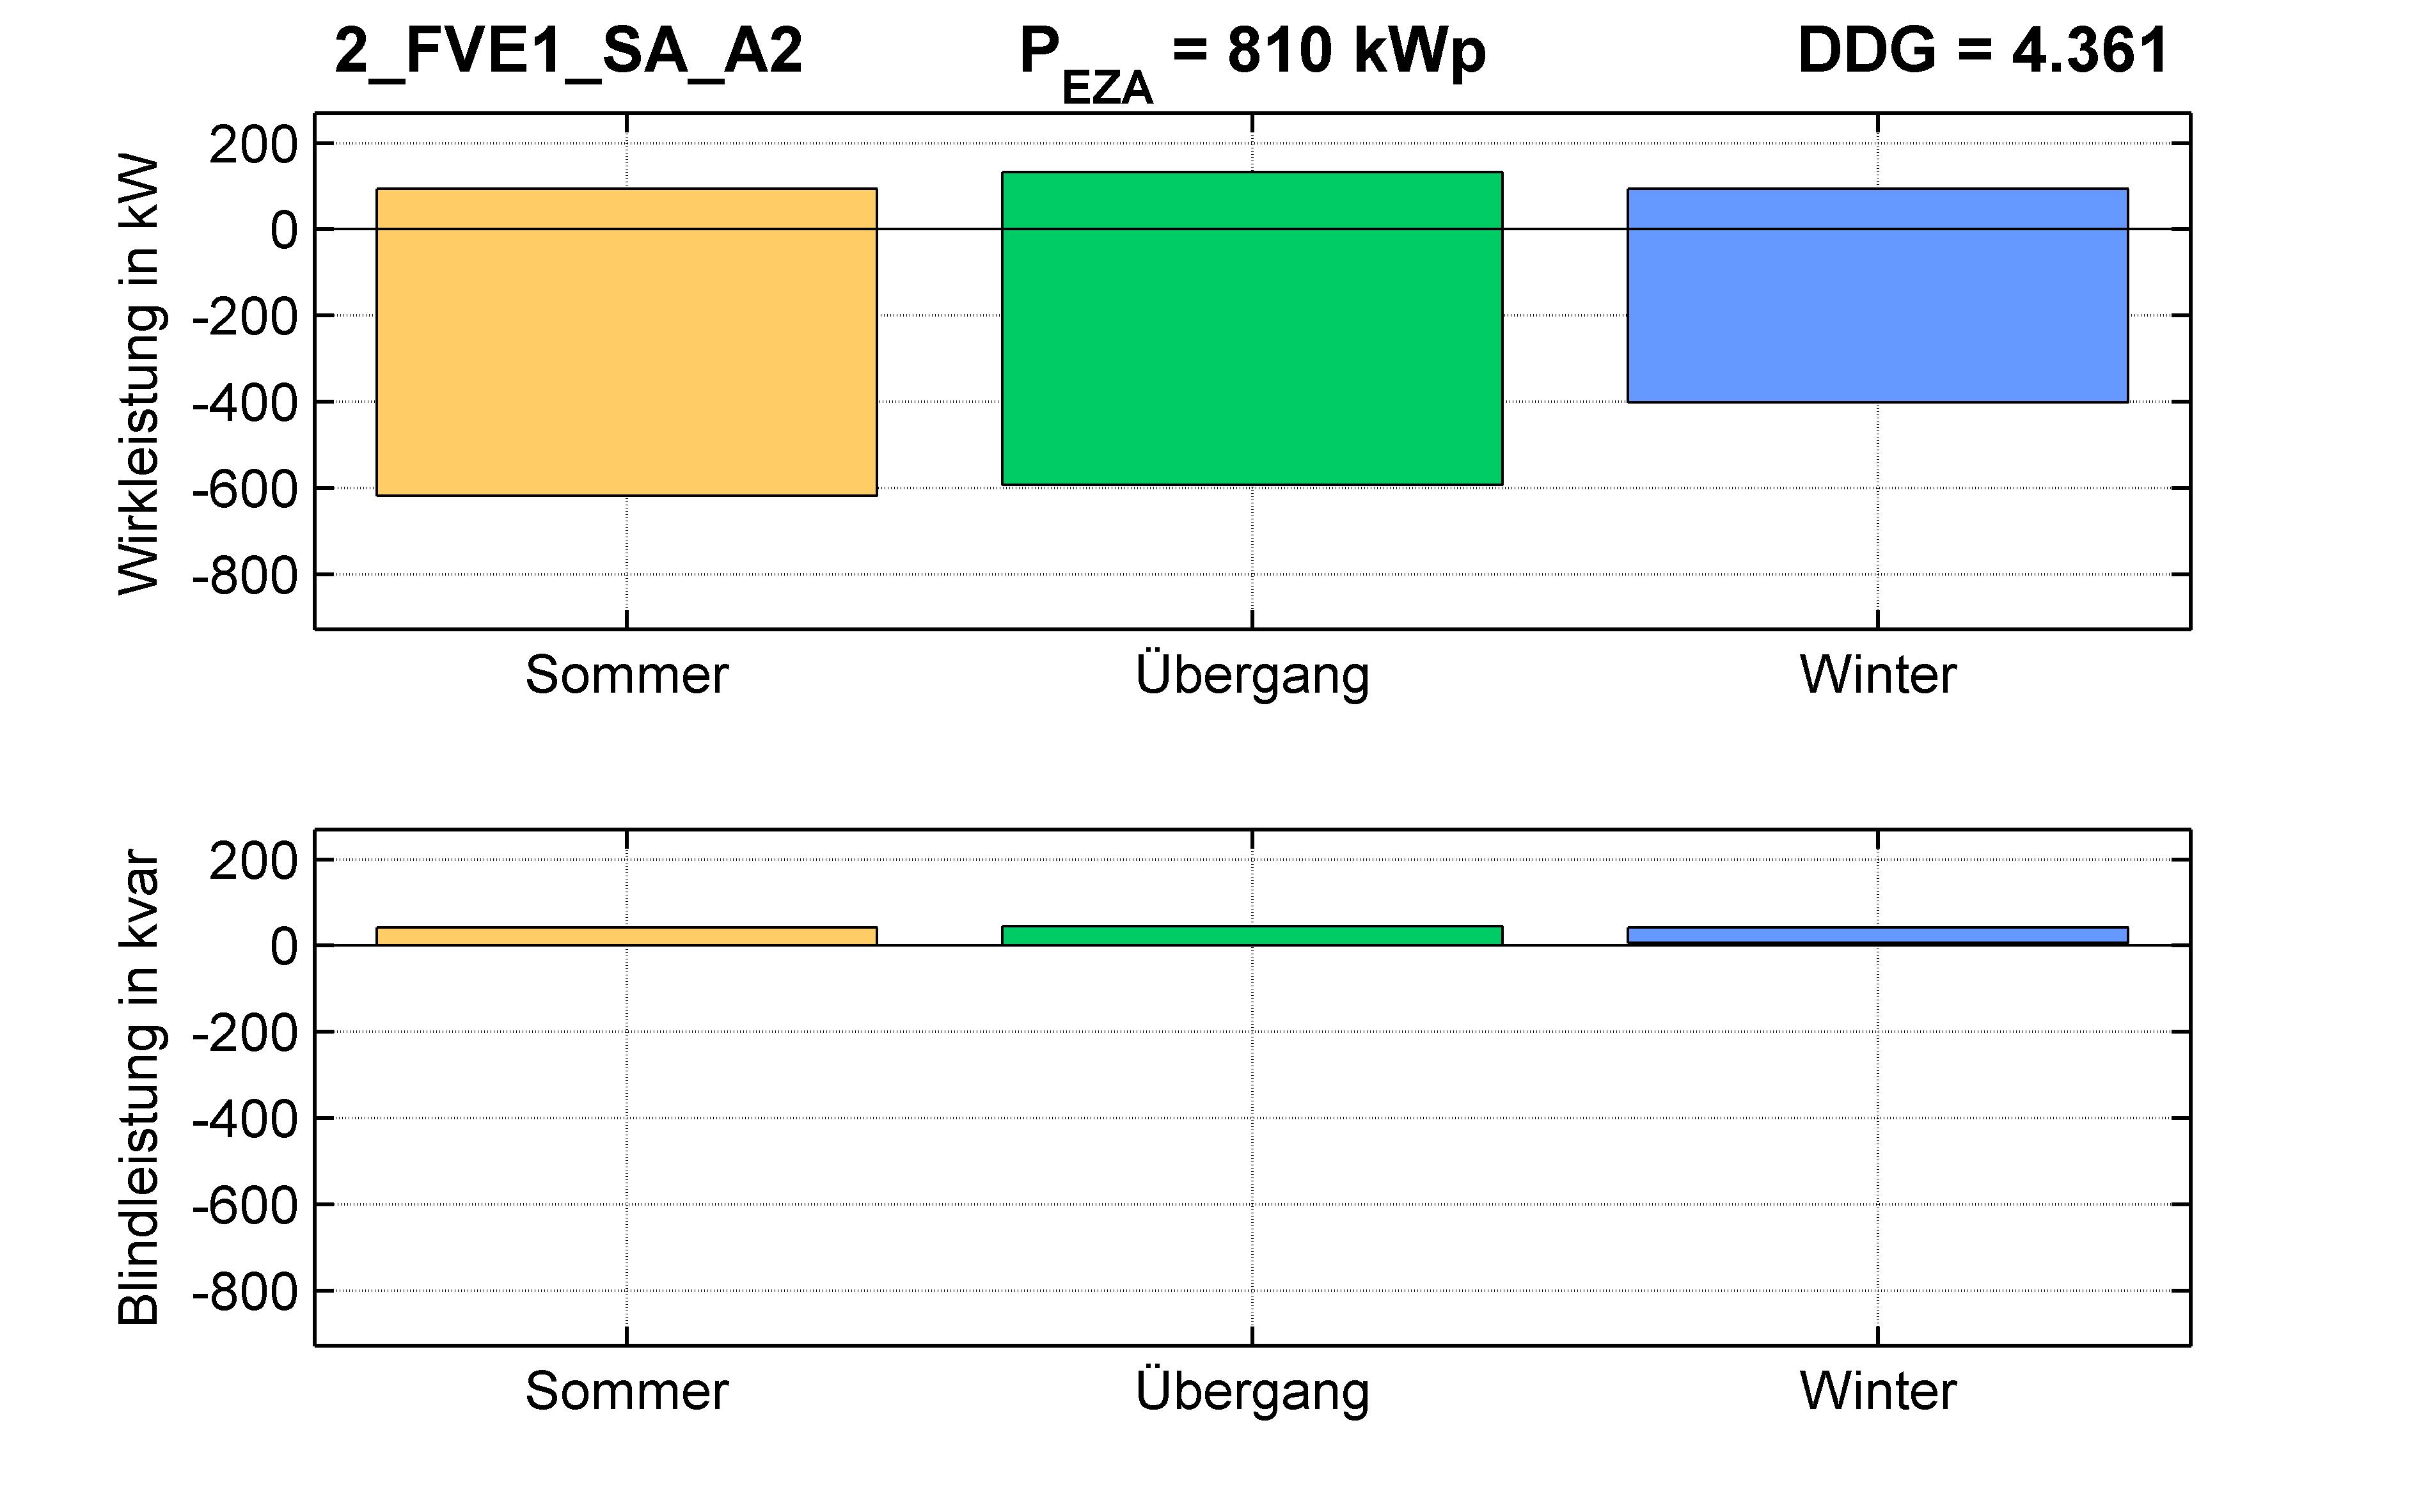 FVE1 | P-Kappung 85% (SA) A2 | PQ-Bilanz